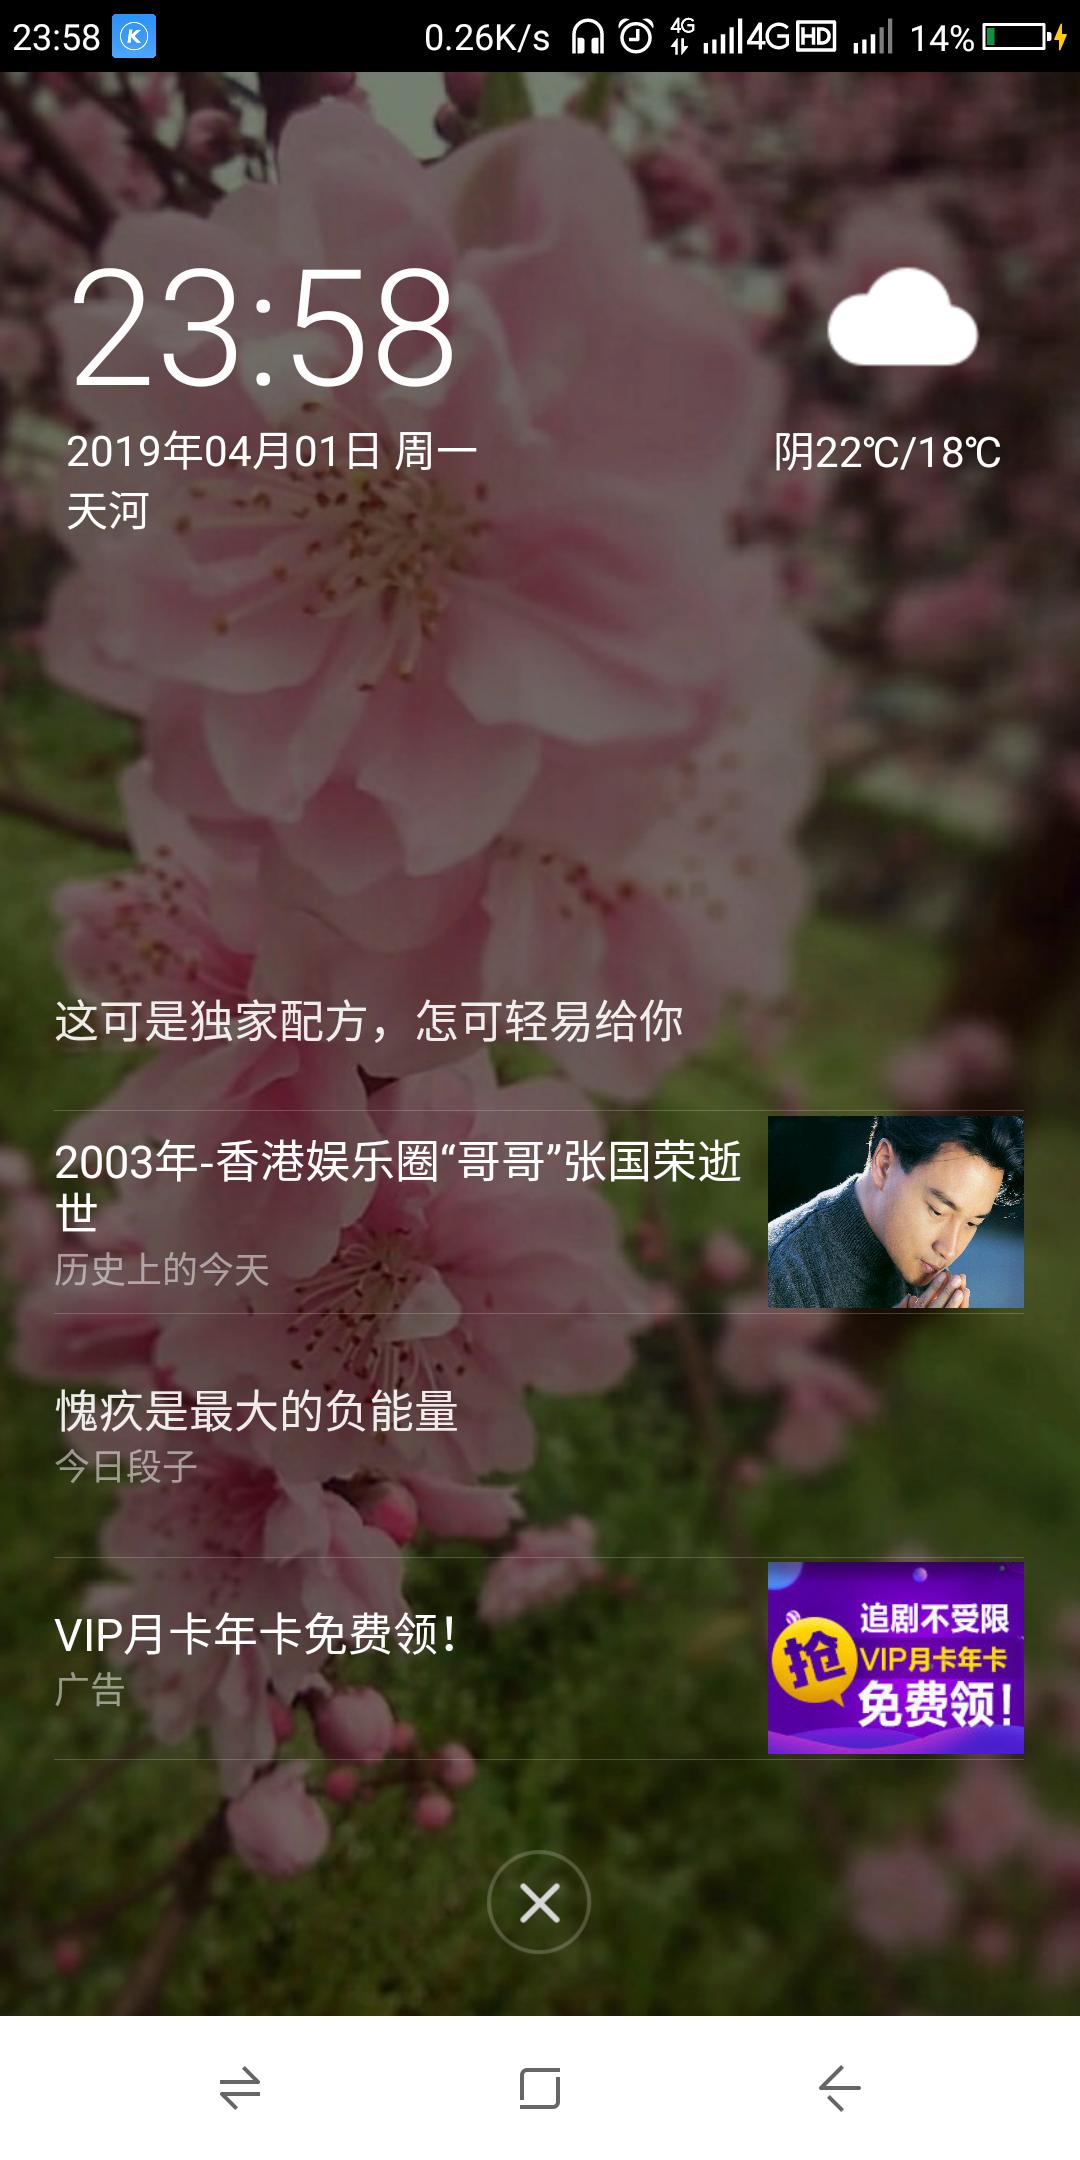 Screenshot_2019-04-01-23-58-30.png